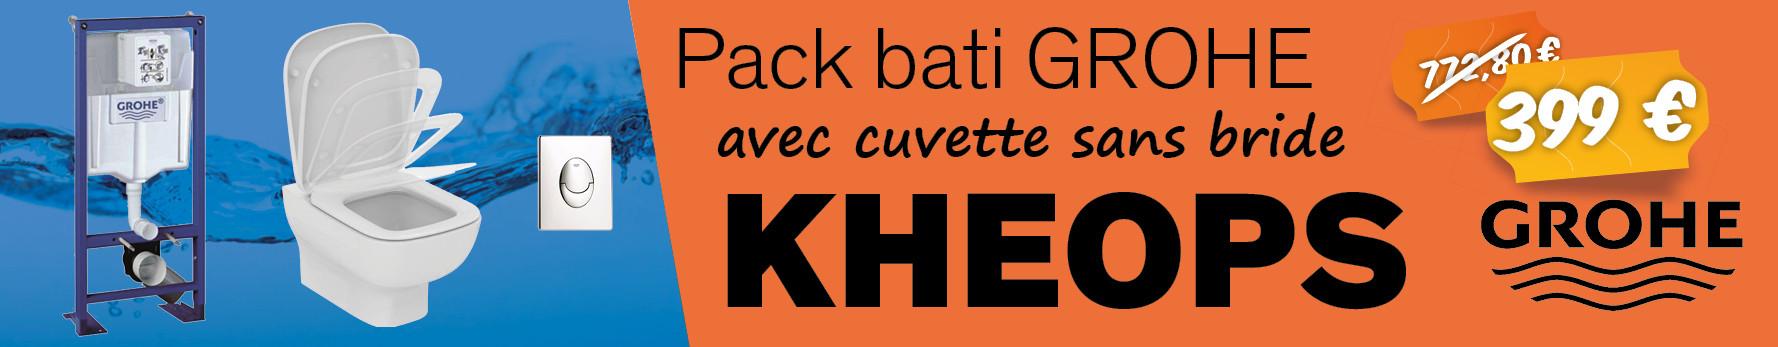 Pack Grohé Rapid SL + Cuvette KHEOPS Aquablade + Plaque Blanche